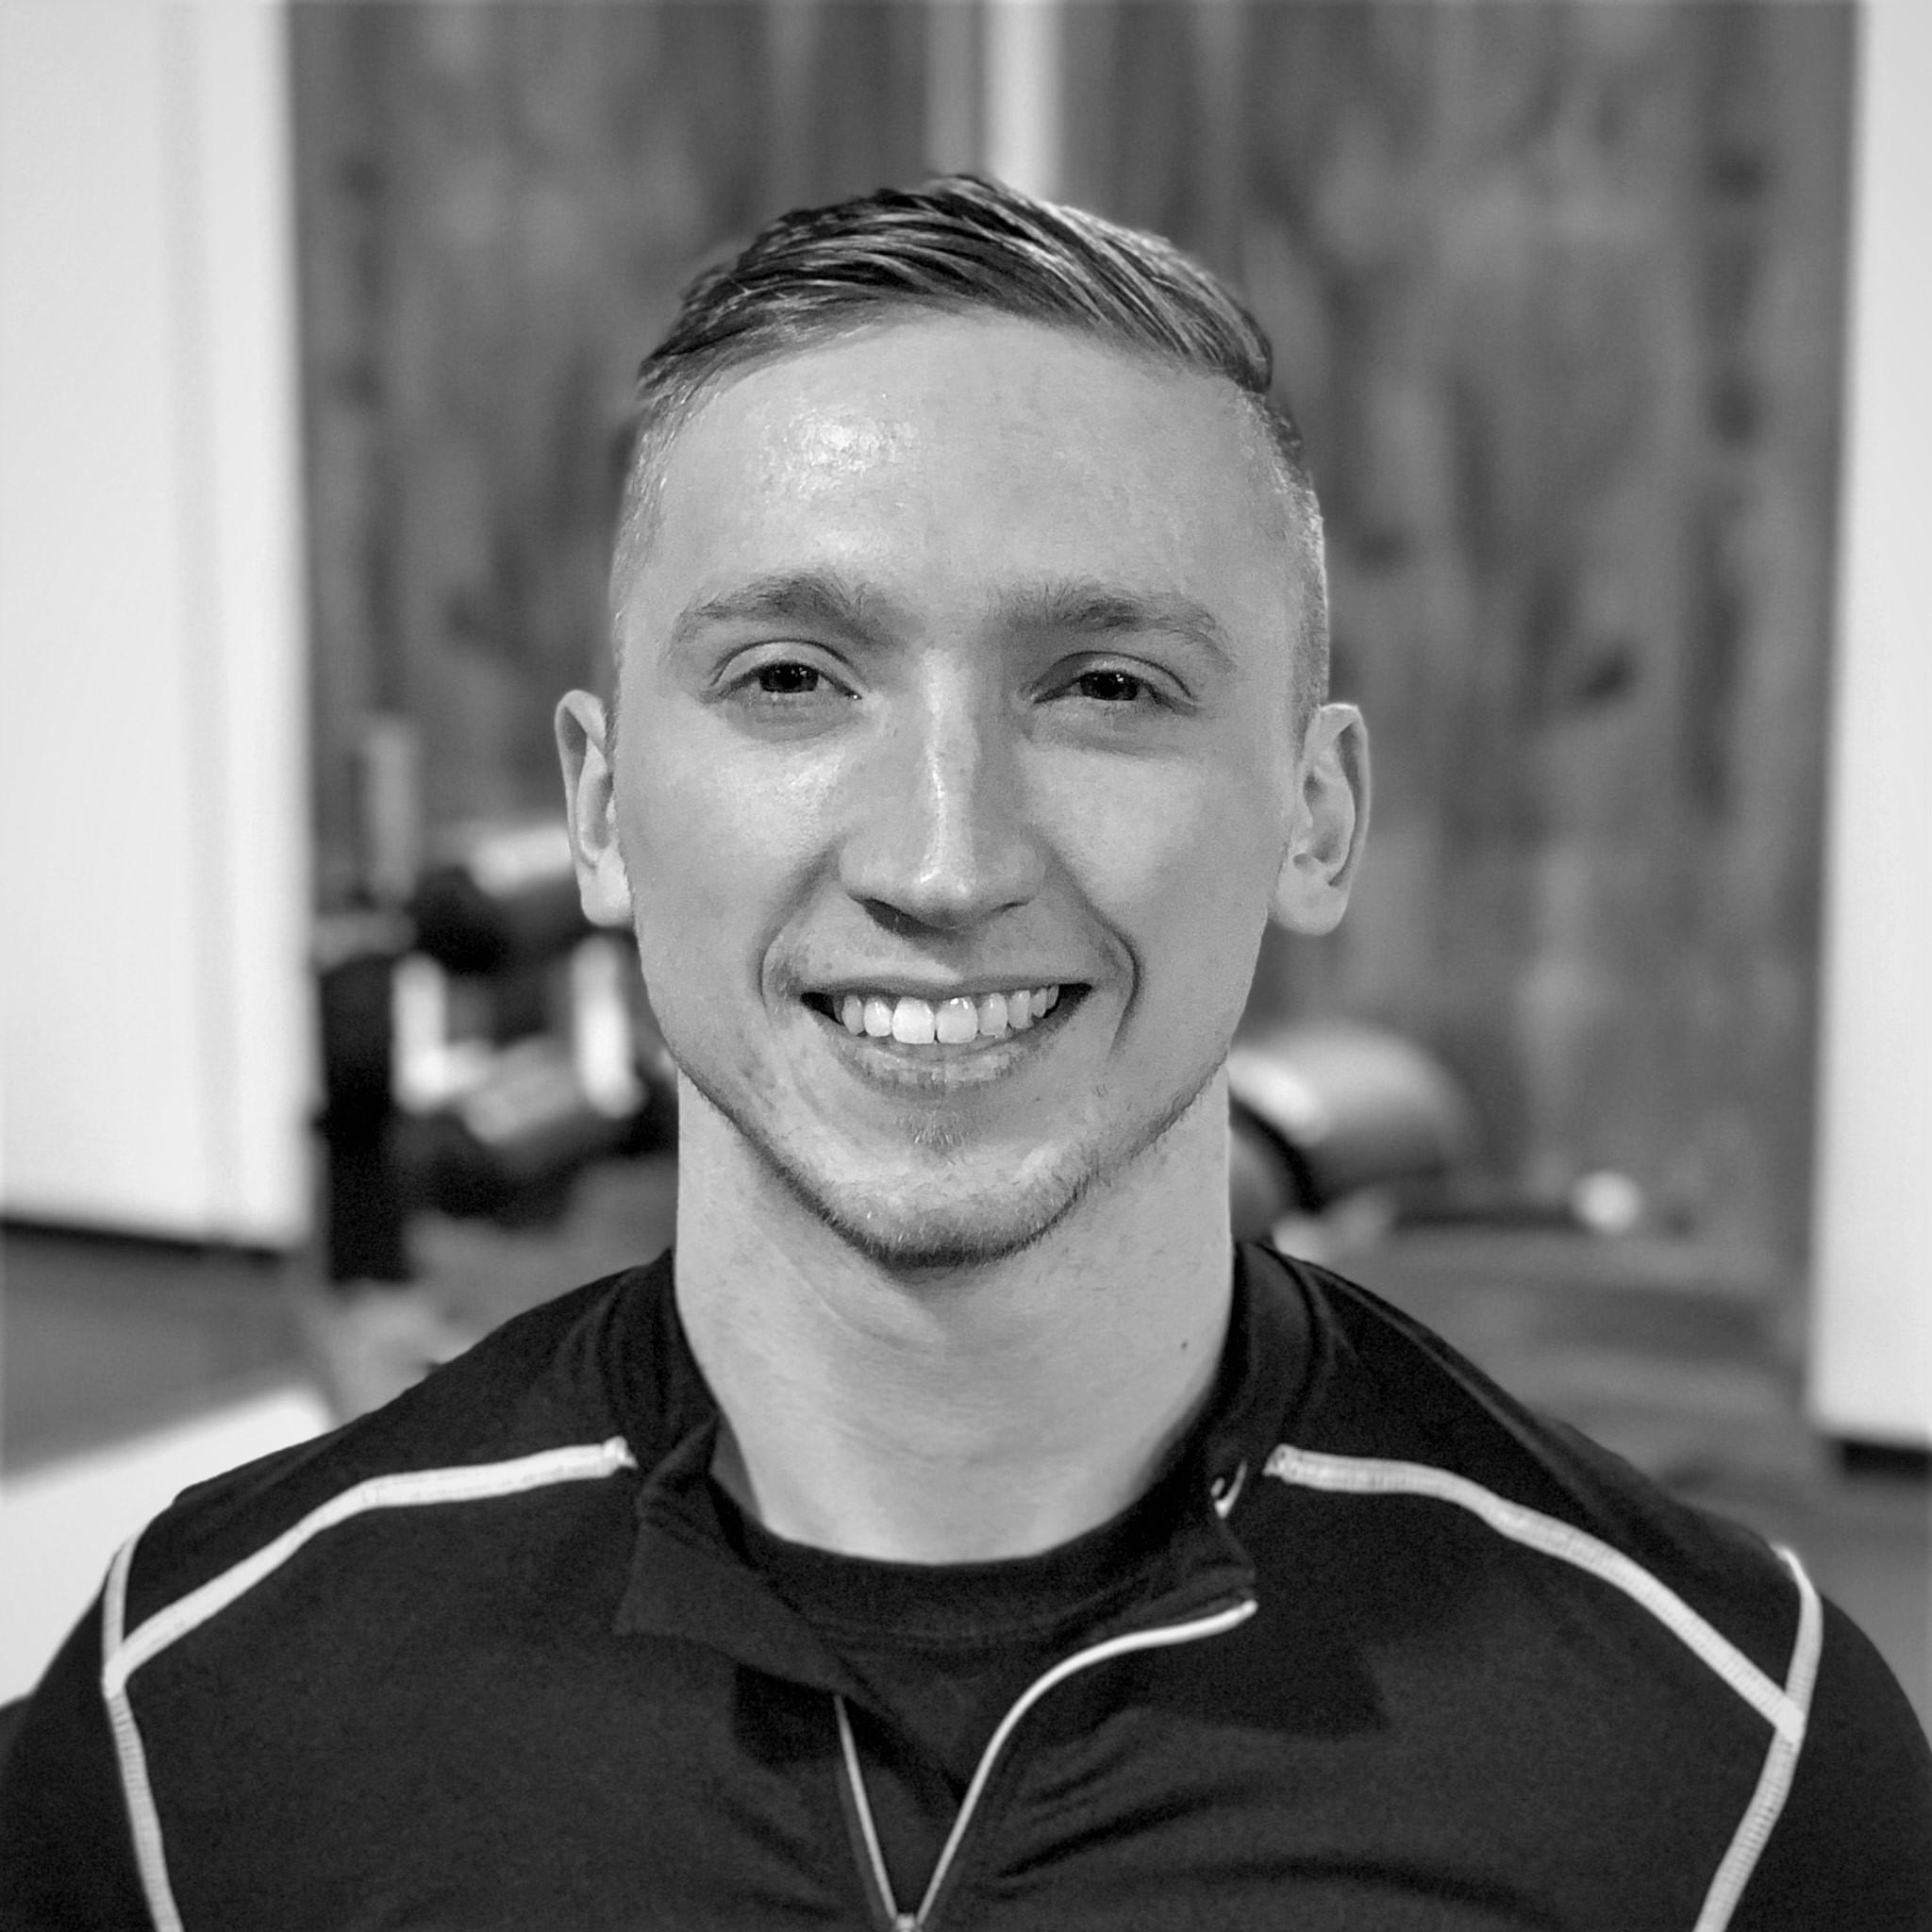 https://www.braceyperformance.com/wp-content/uploads/2020/06/JakeBW.jpg